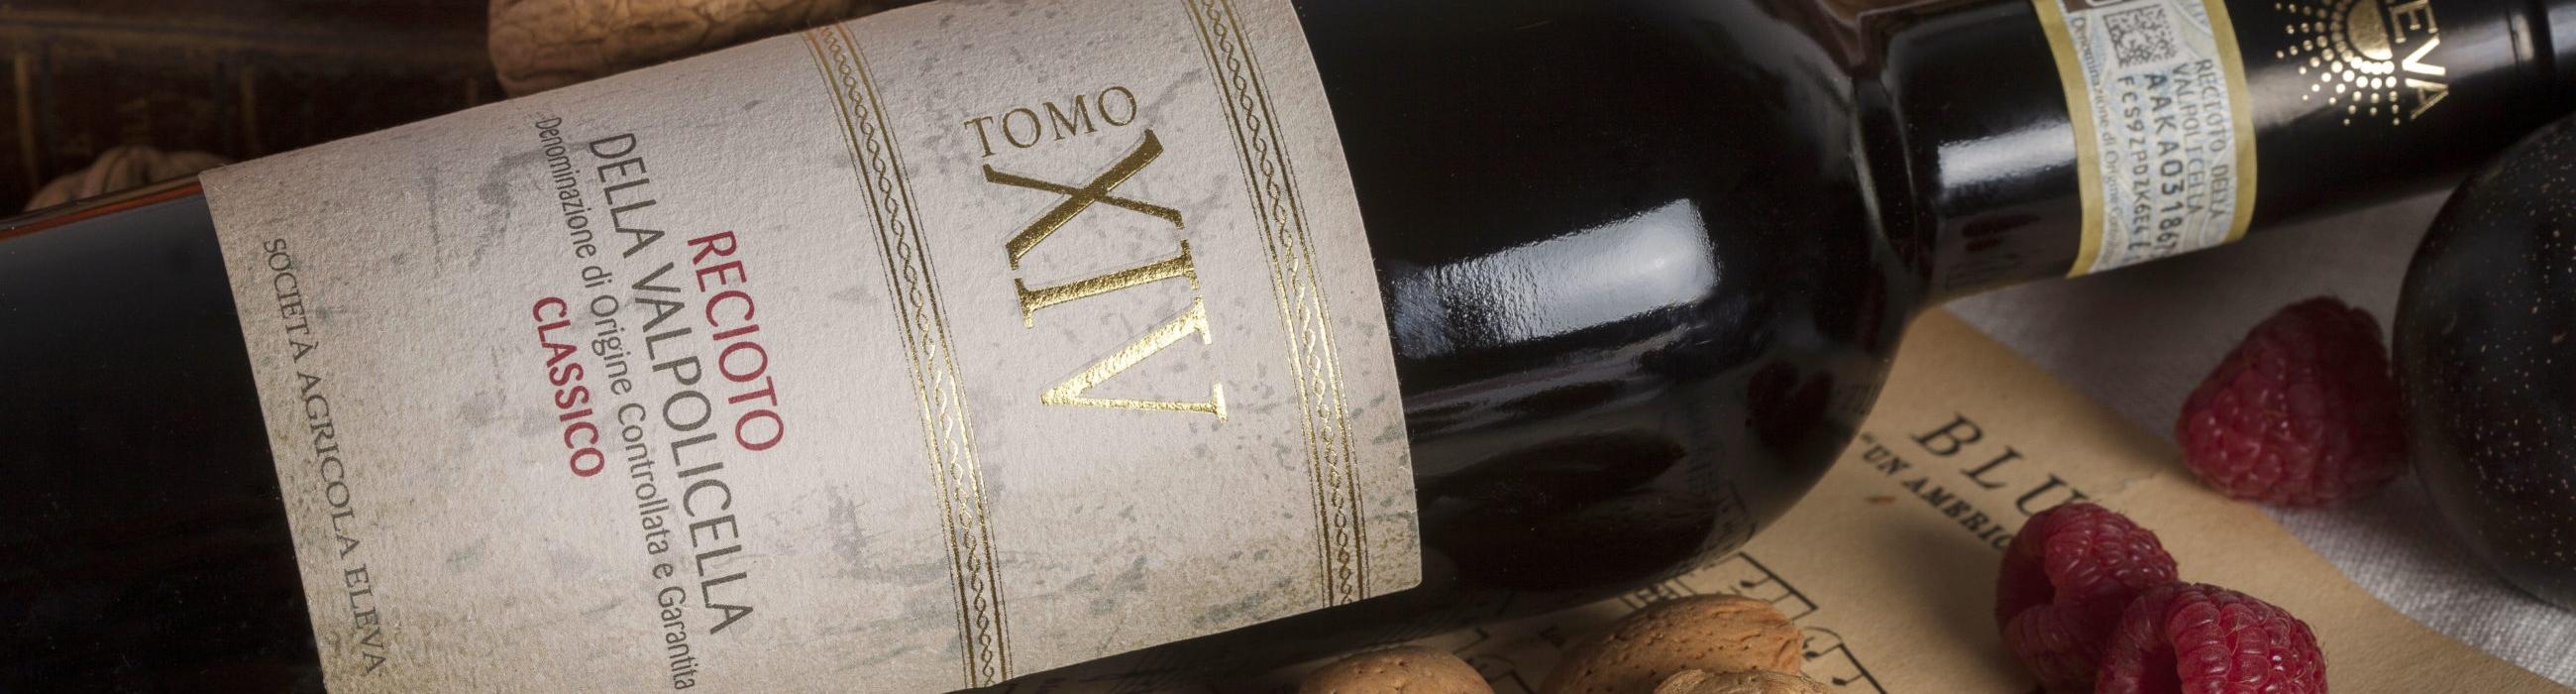 Slider Tomo XIV Noci